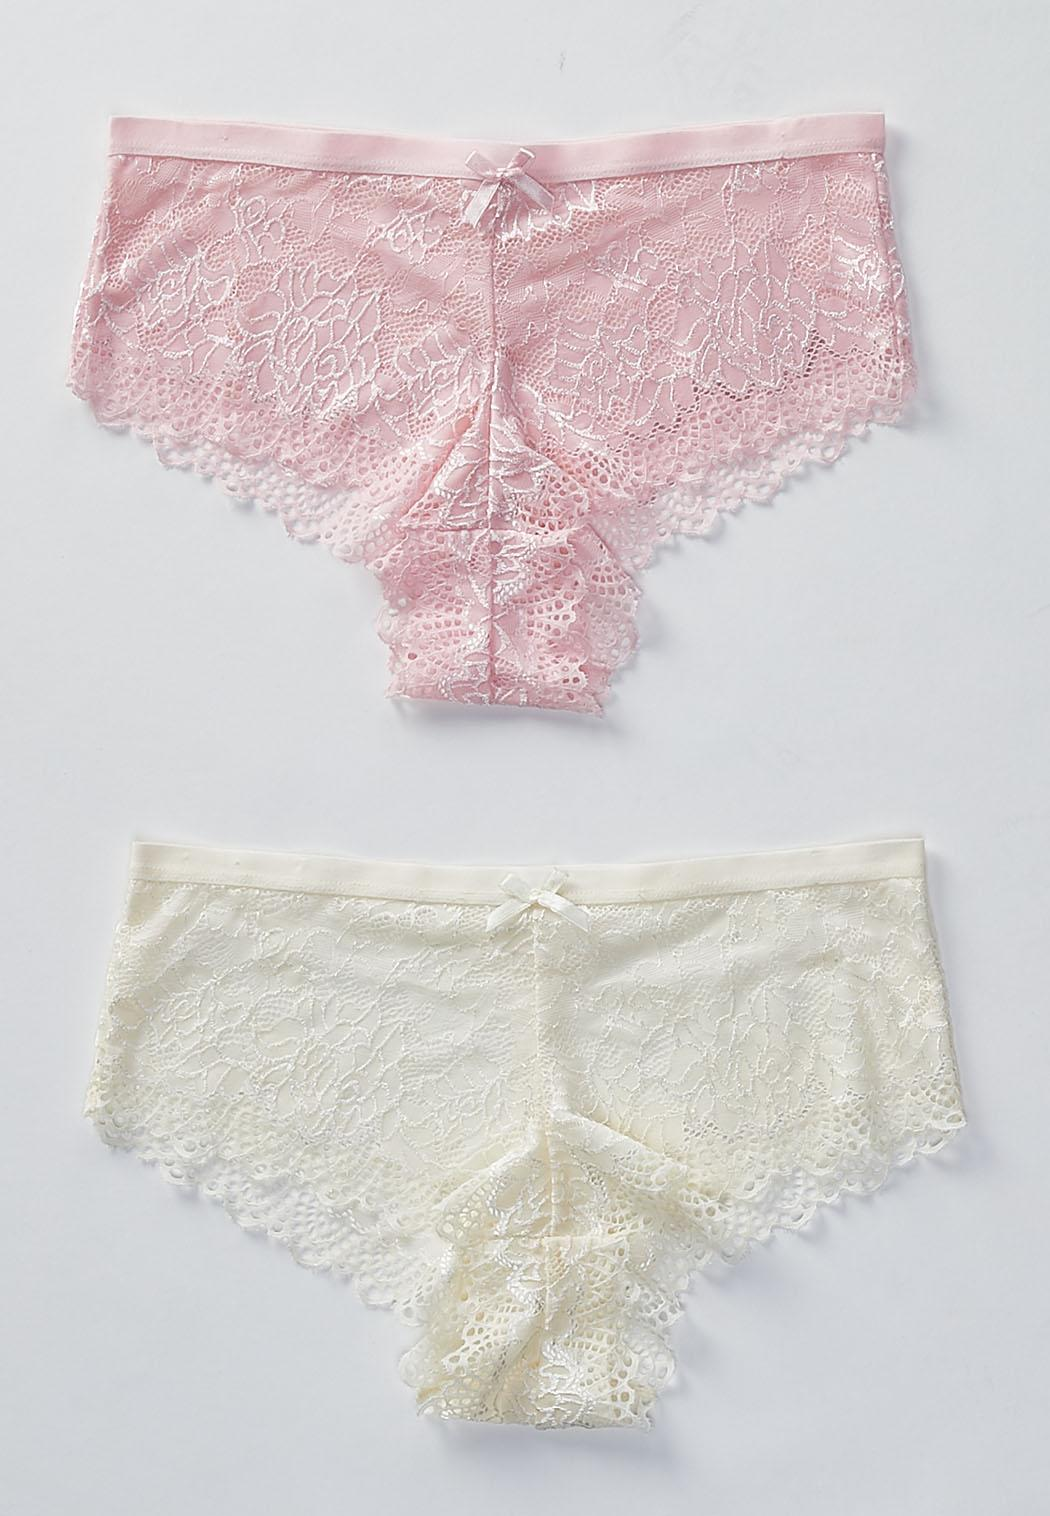 e4cf3d74511 Pink Lace And Ivory Bra Set Panties Cato Fashions